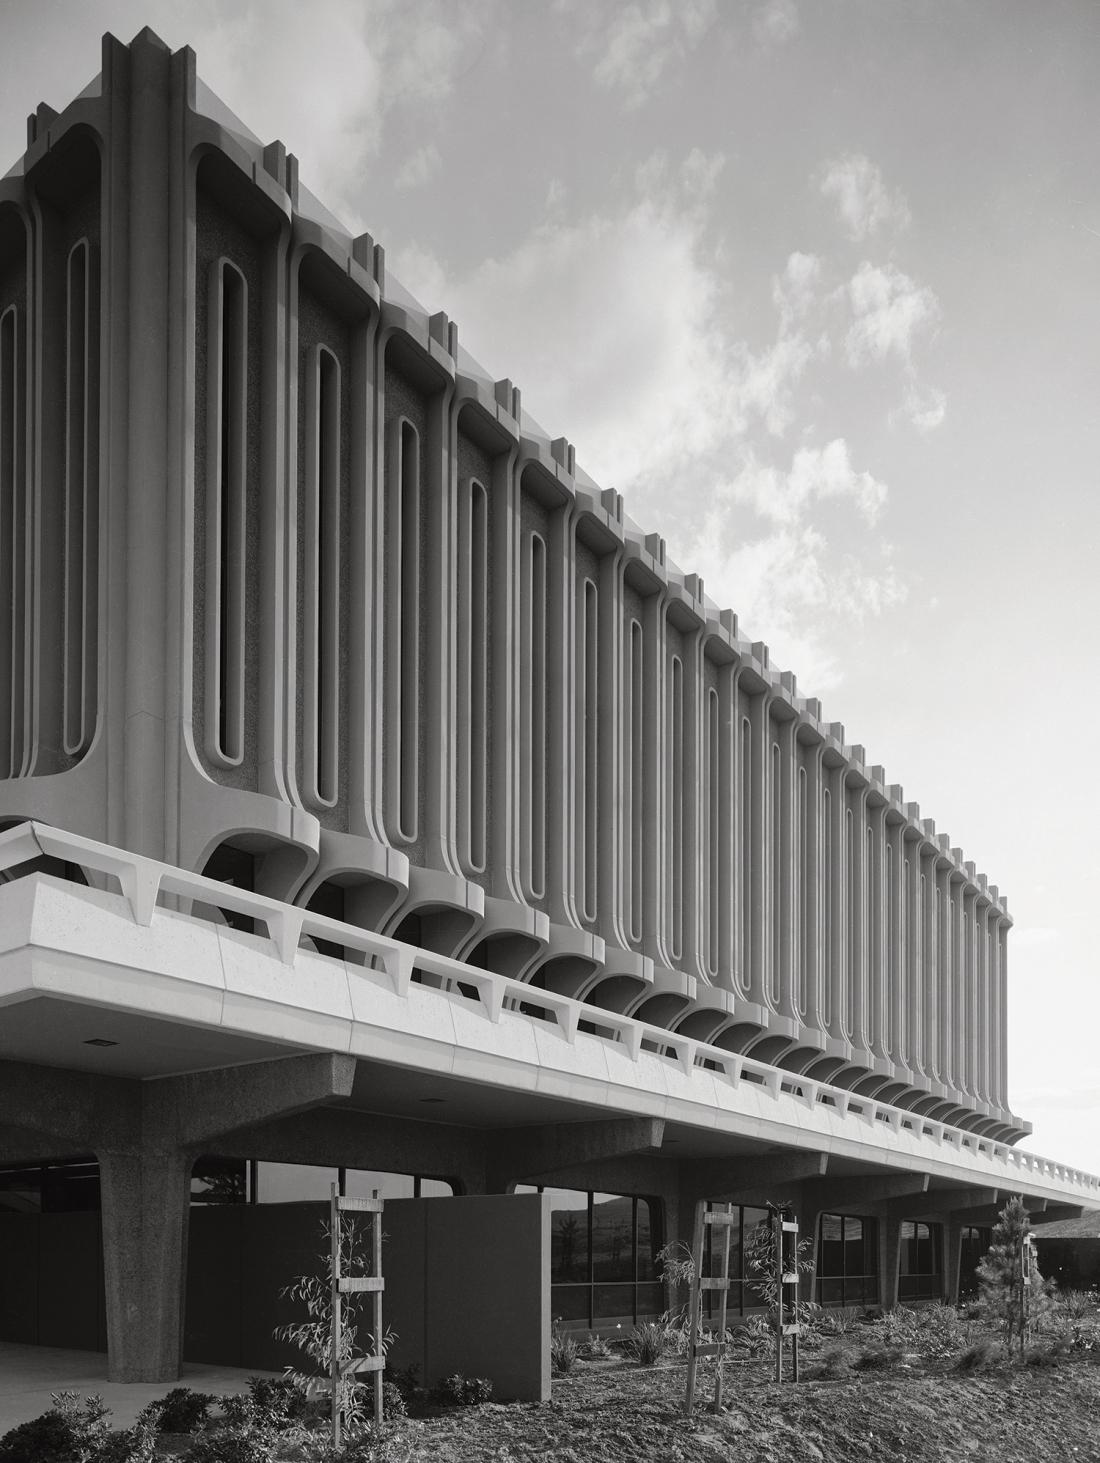 William L. Pereira & Associates, University of California, Irvine, 1966. Picture credit: courtesy of the Estate of Marvin Rand